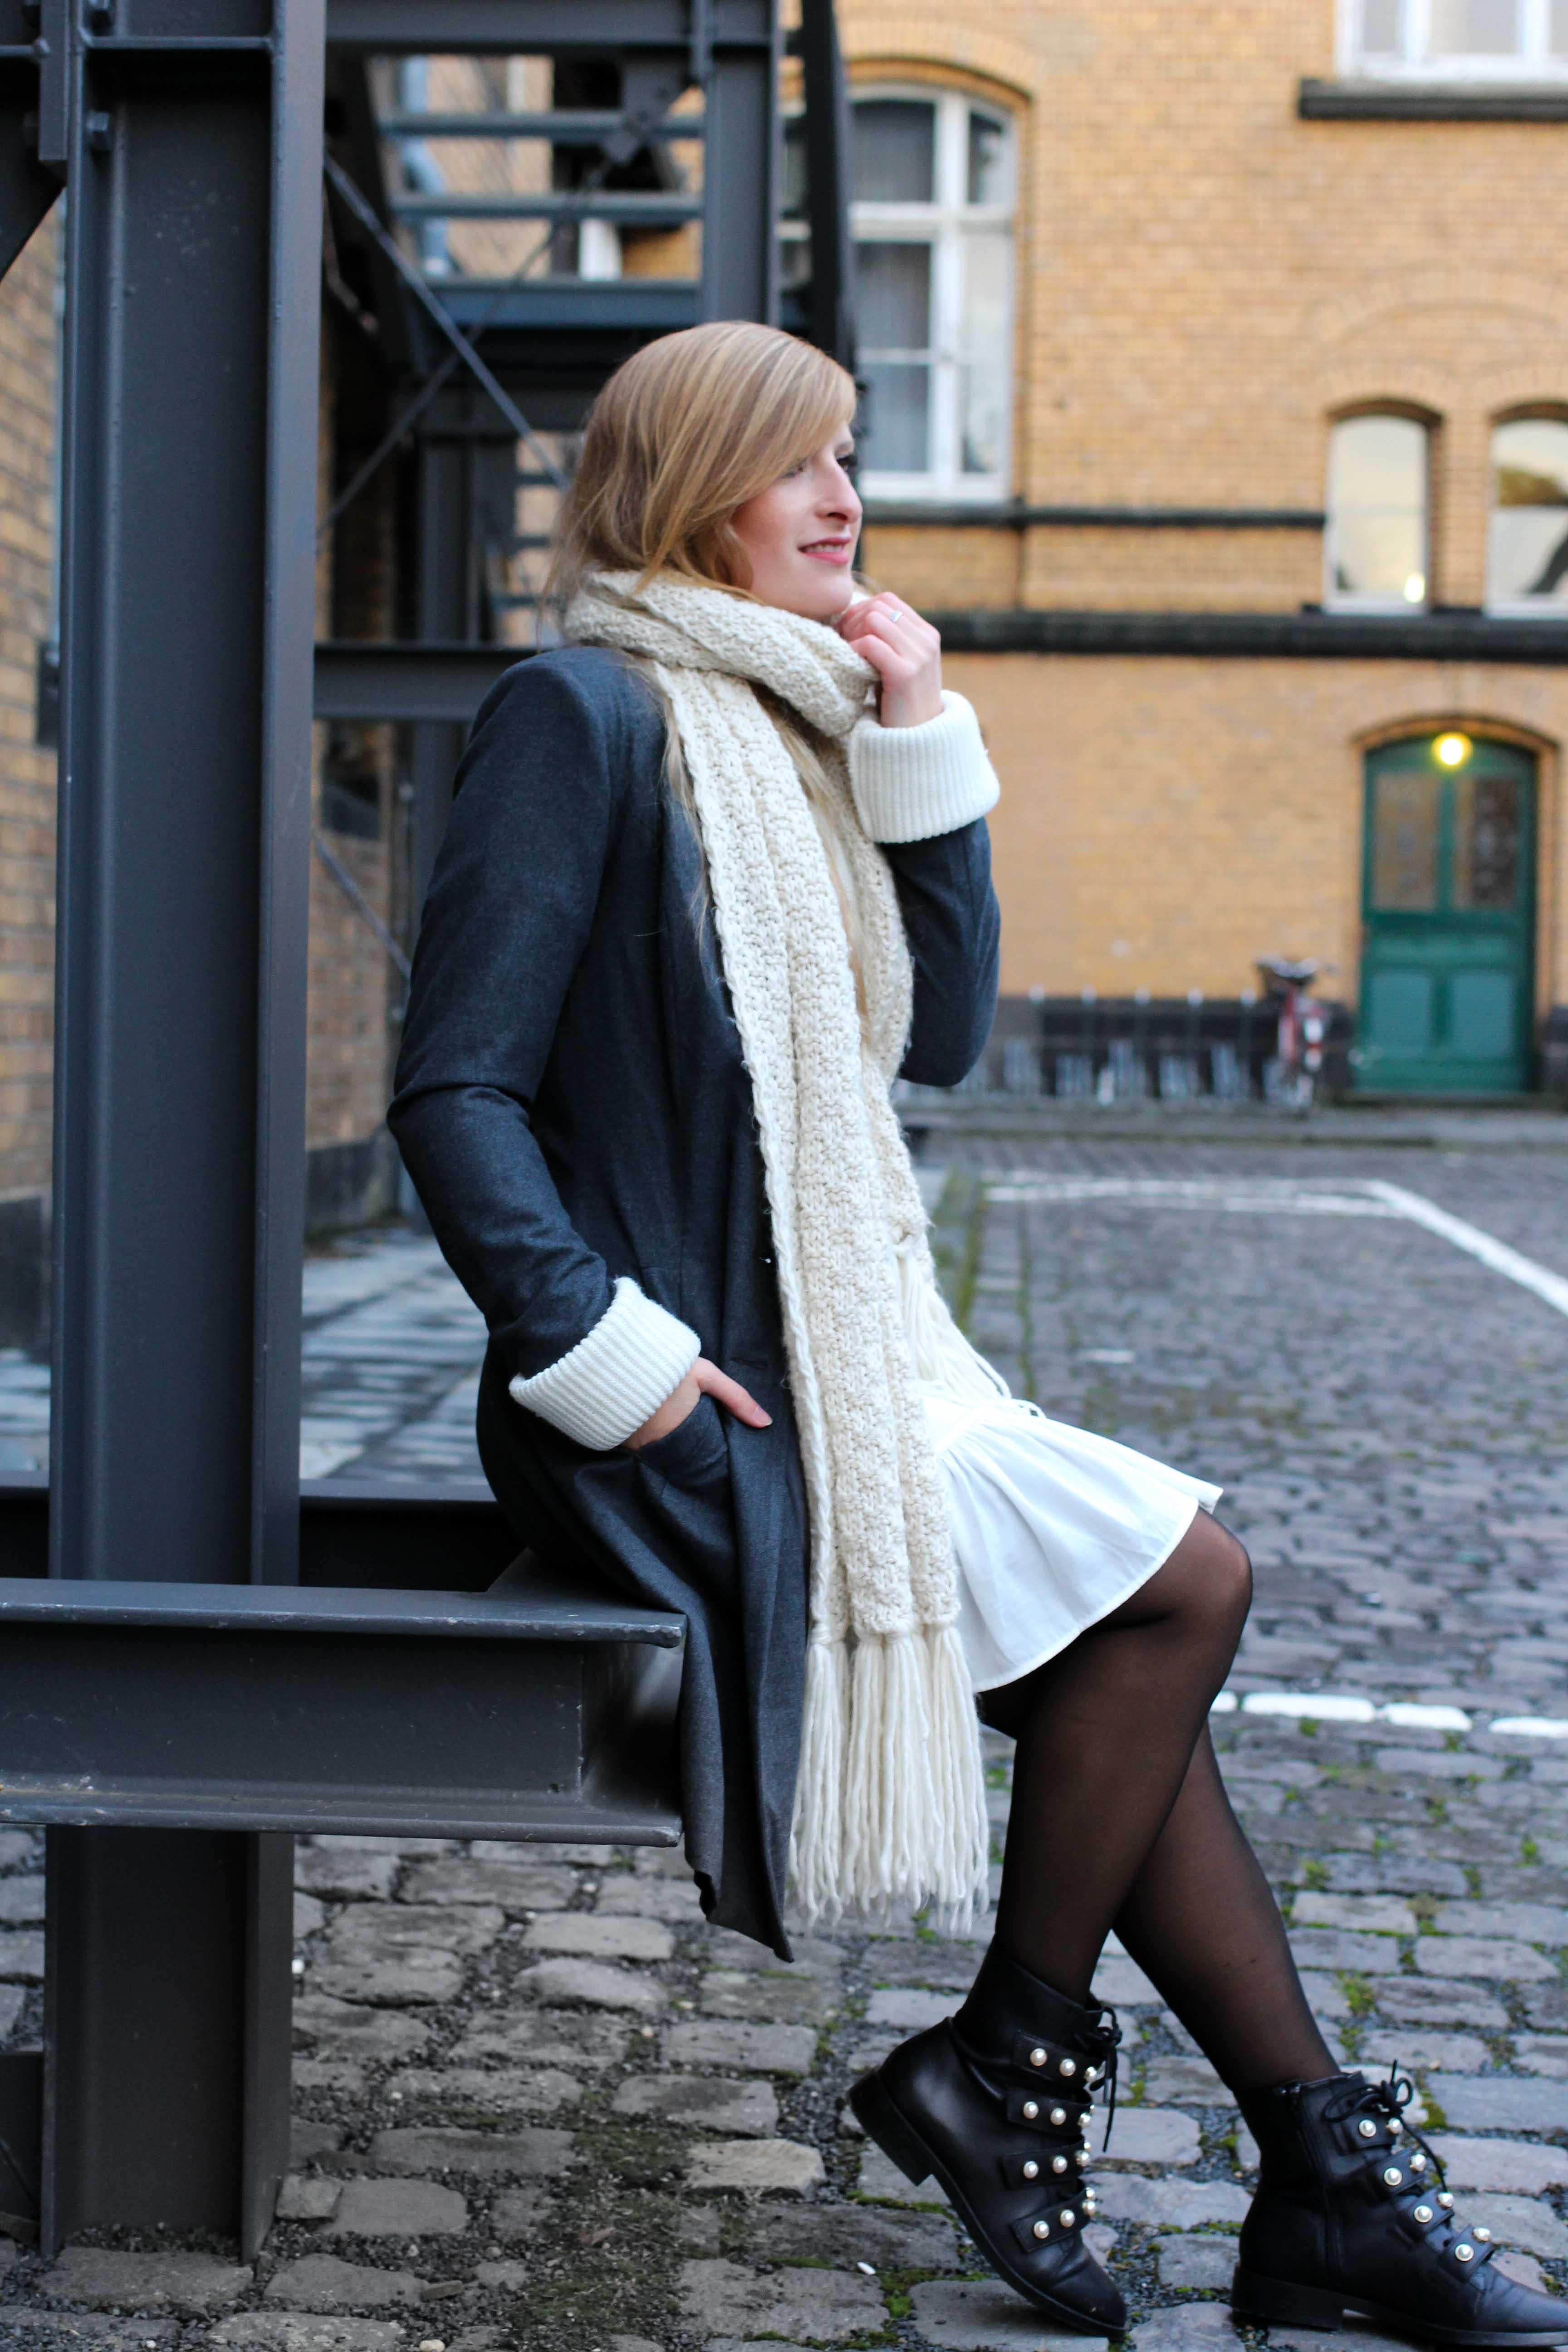 Winter-Layering weißes Kleid, Ripped Pullover Asos schwarze Strumpfhose Hunkemöller kombinieren Outfit Modeblog bonn 4